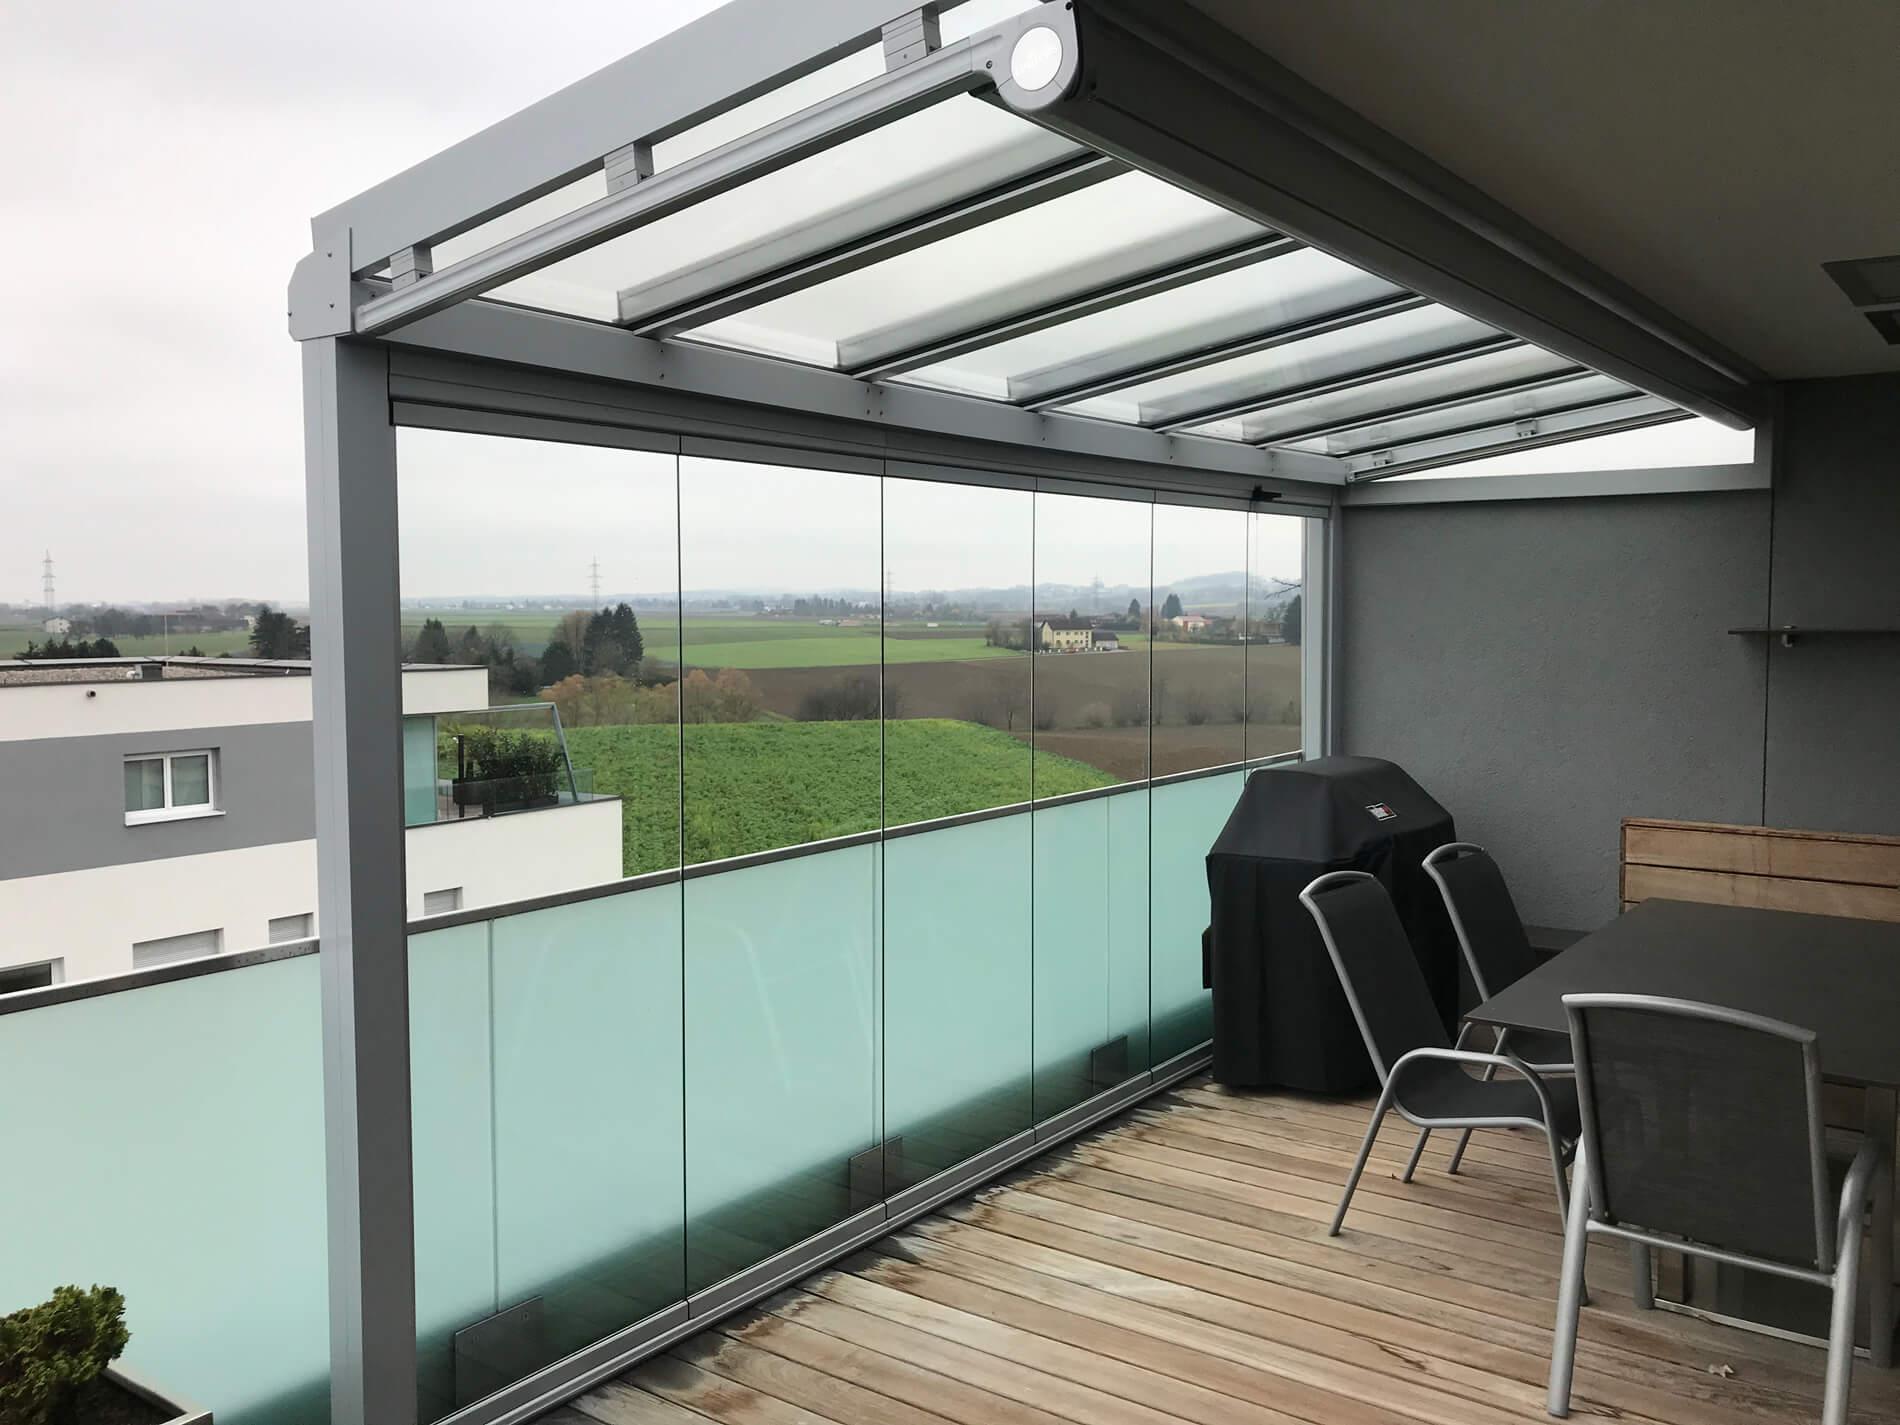 Aluminium-Terrassenüberdachung auf Balkon montiert